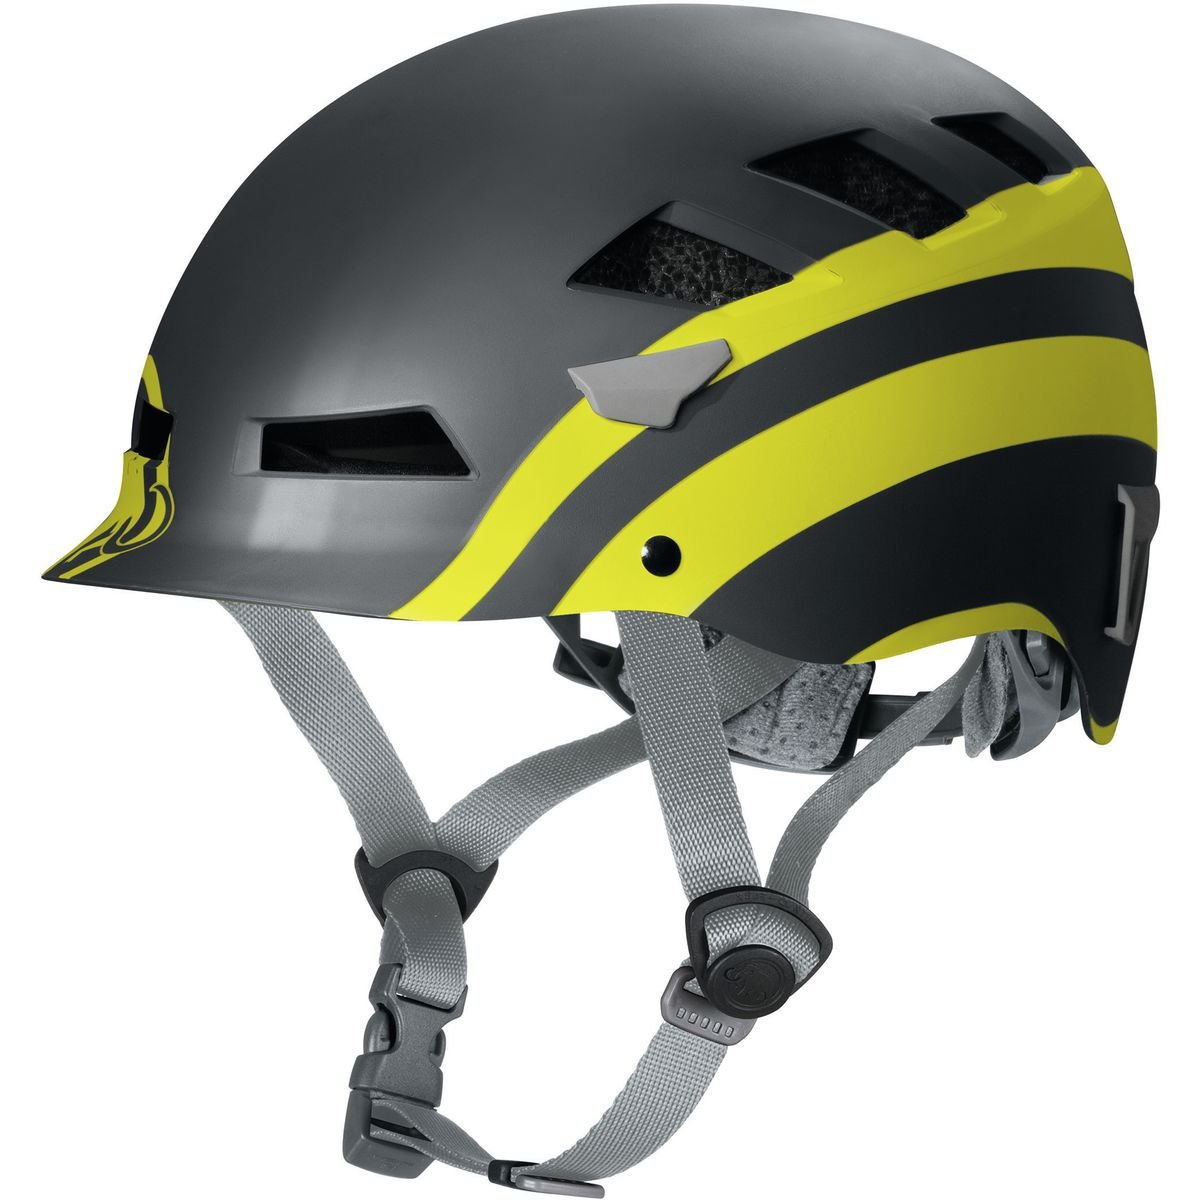 Mammut Erwachsene Helm El Cap jetzt bestellen